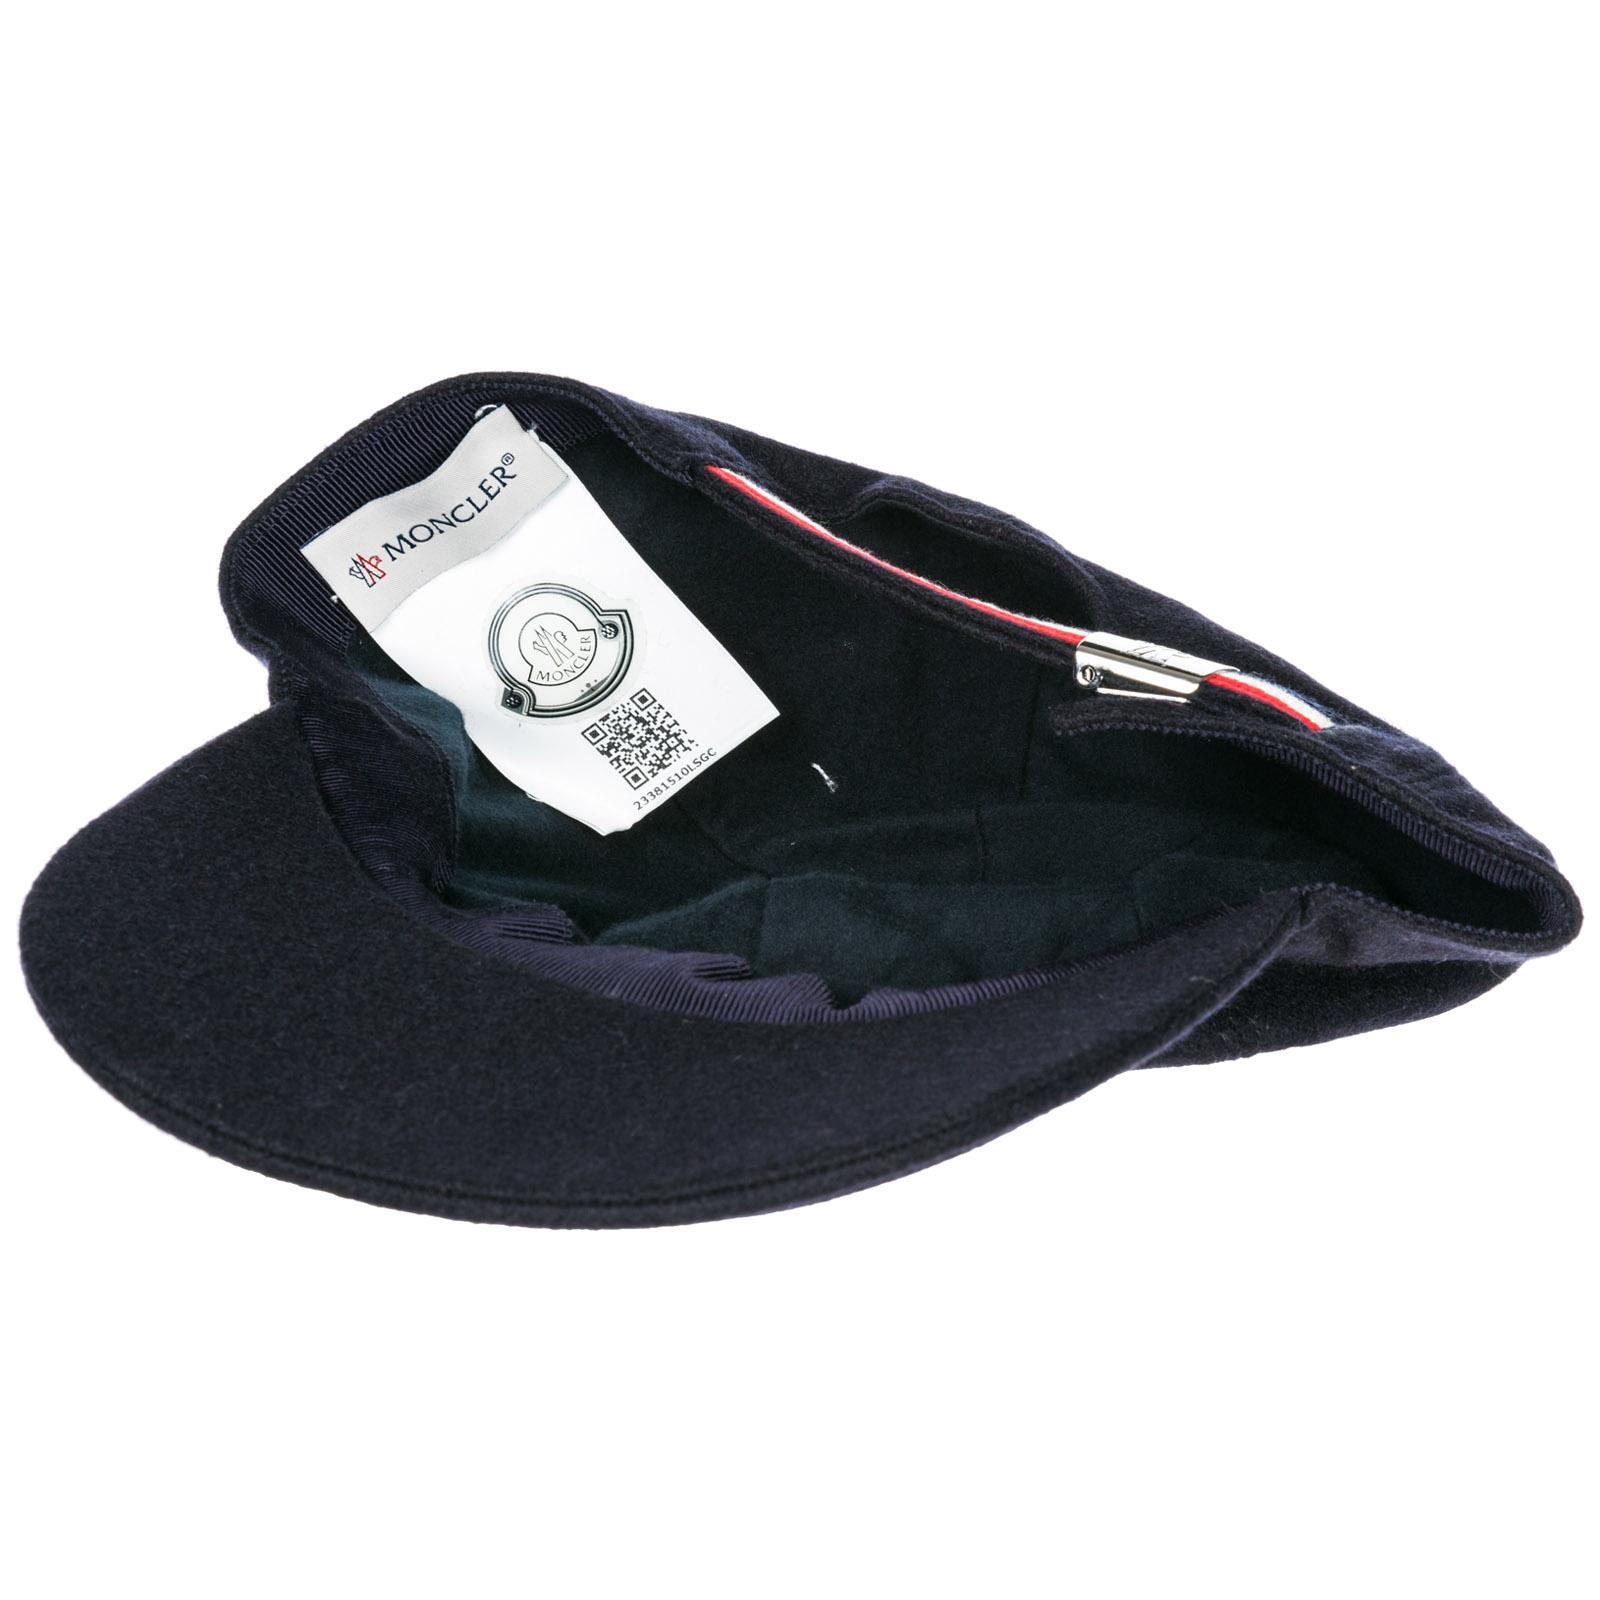 ae2611249f1 Baseball cap Moncler 00967000424A742 blu navy